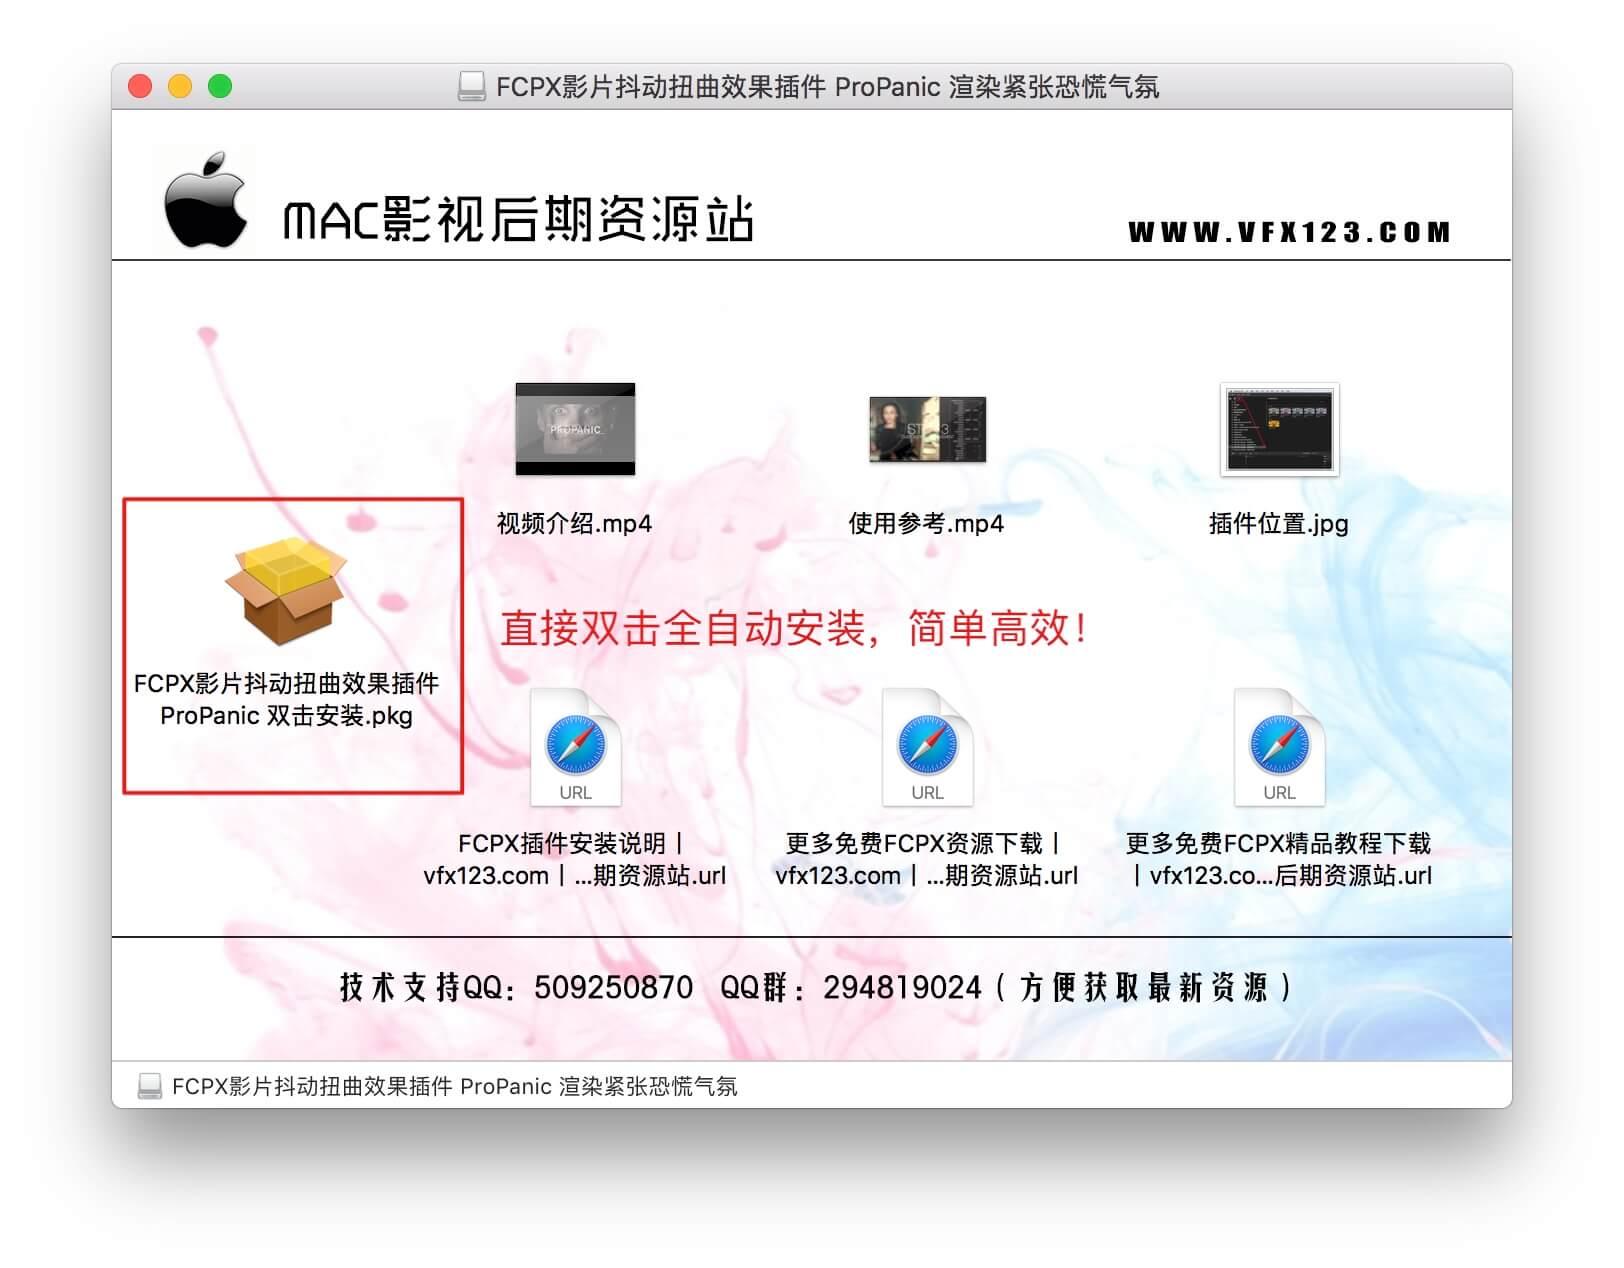 fcpx插件怎么安装? Final cut pro x 插件安装教程